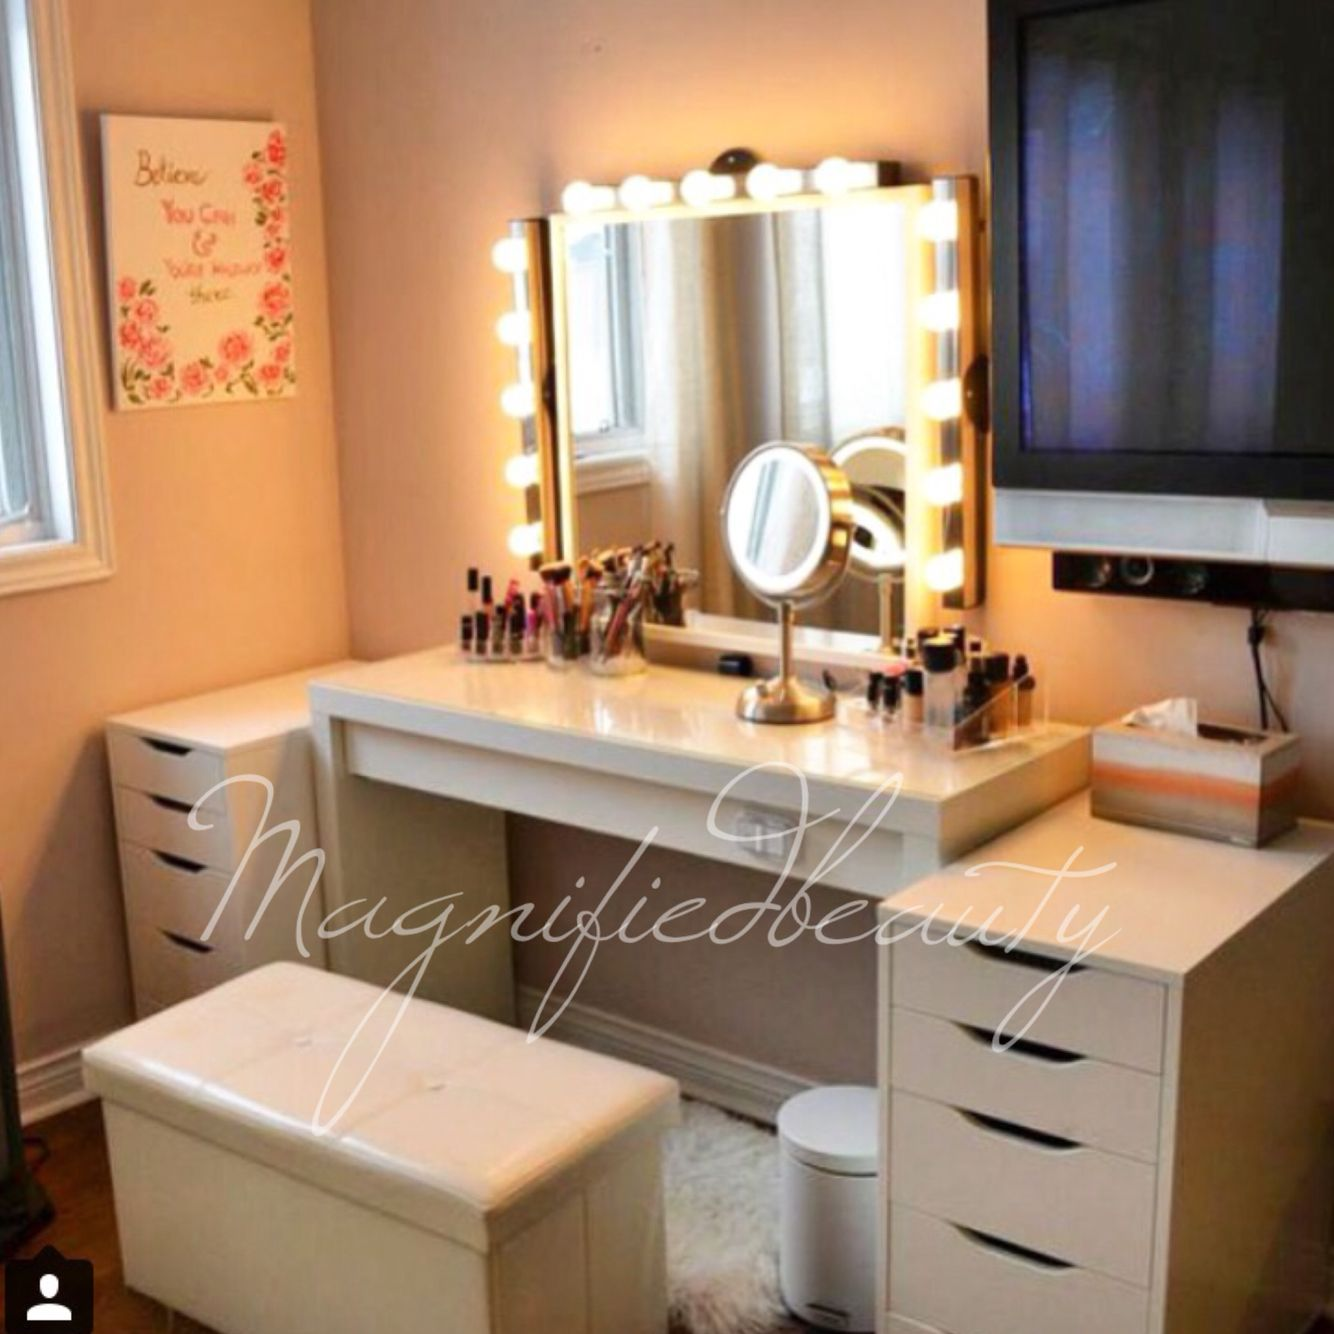 IKEA vanity by magnifiedbeauty on Instagram. Malm